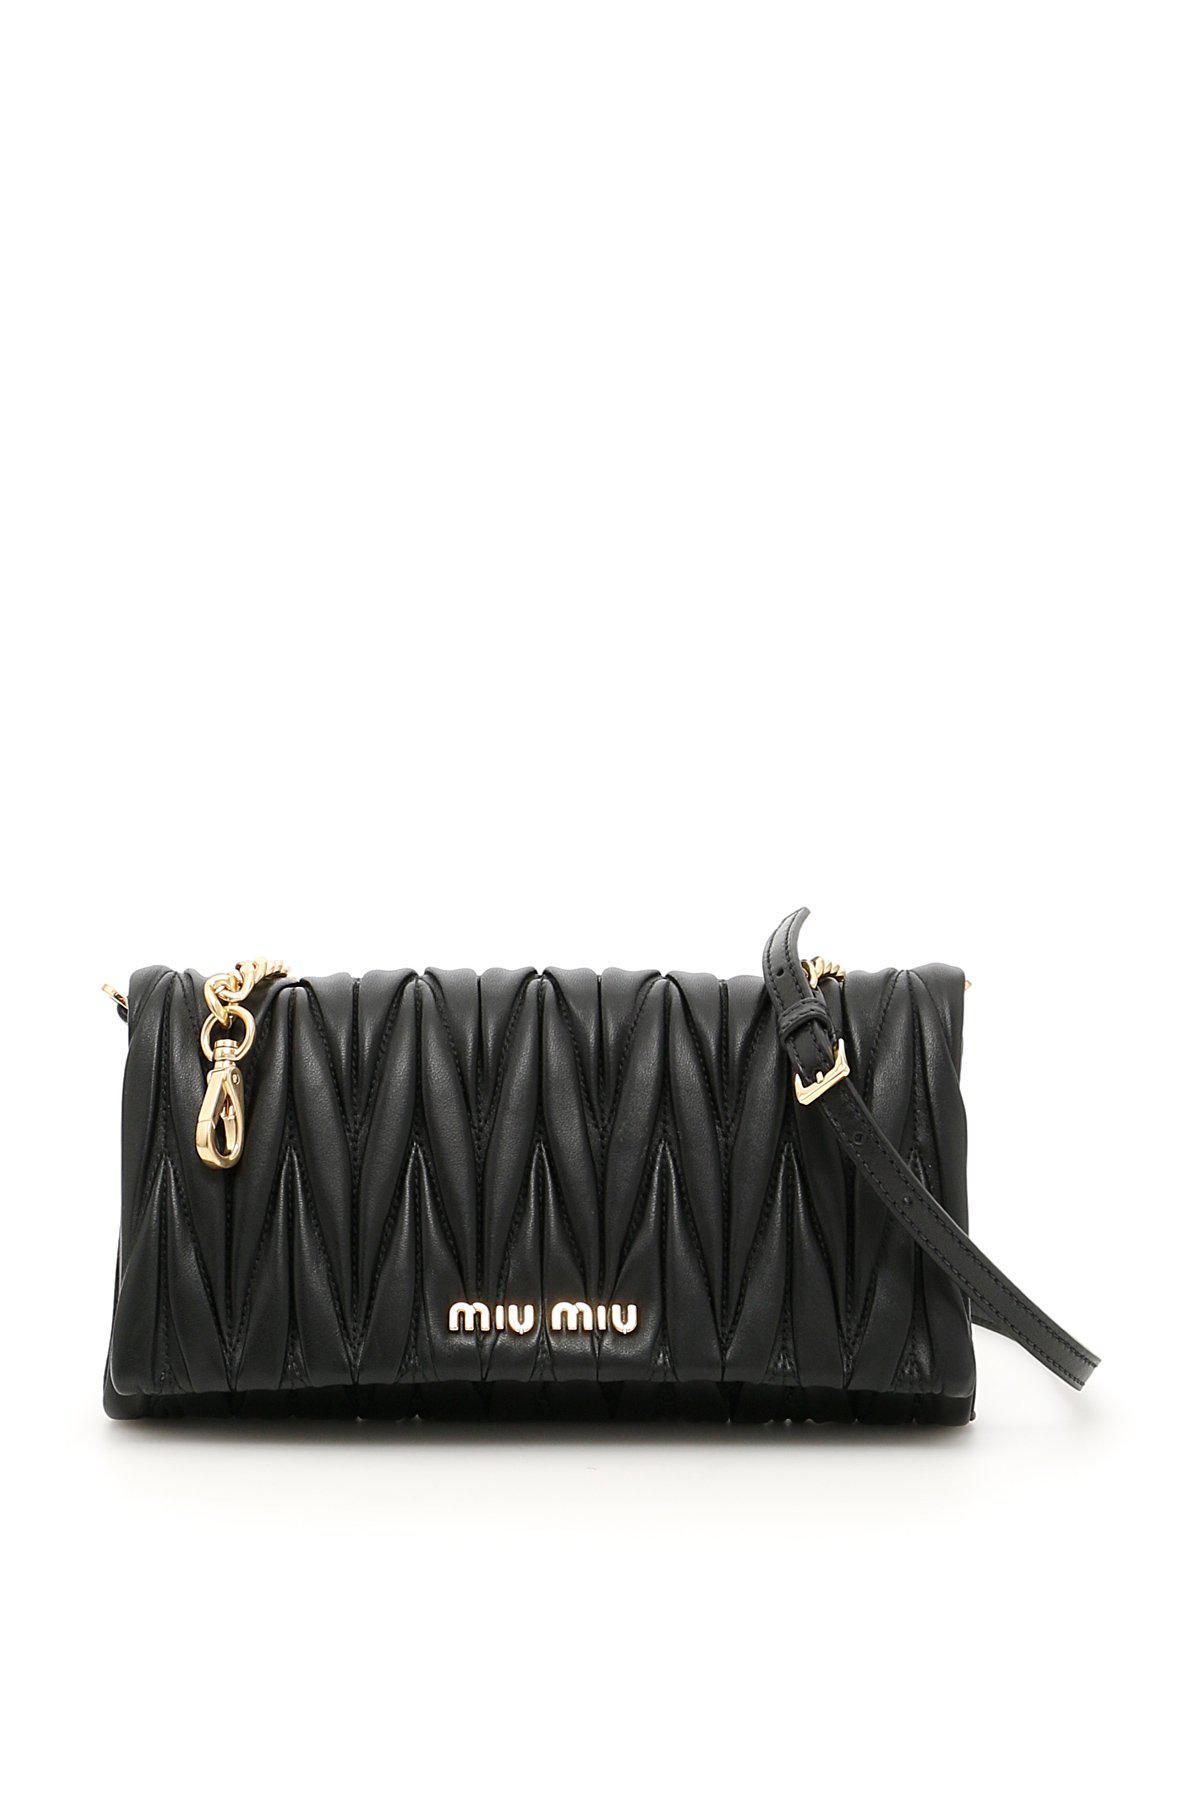 9edcfc96b087 Miu Miu - Black Matellassè Shoulder Bag - Lyst. View fullscreen